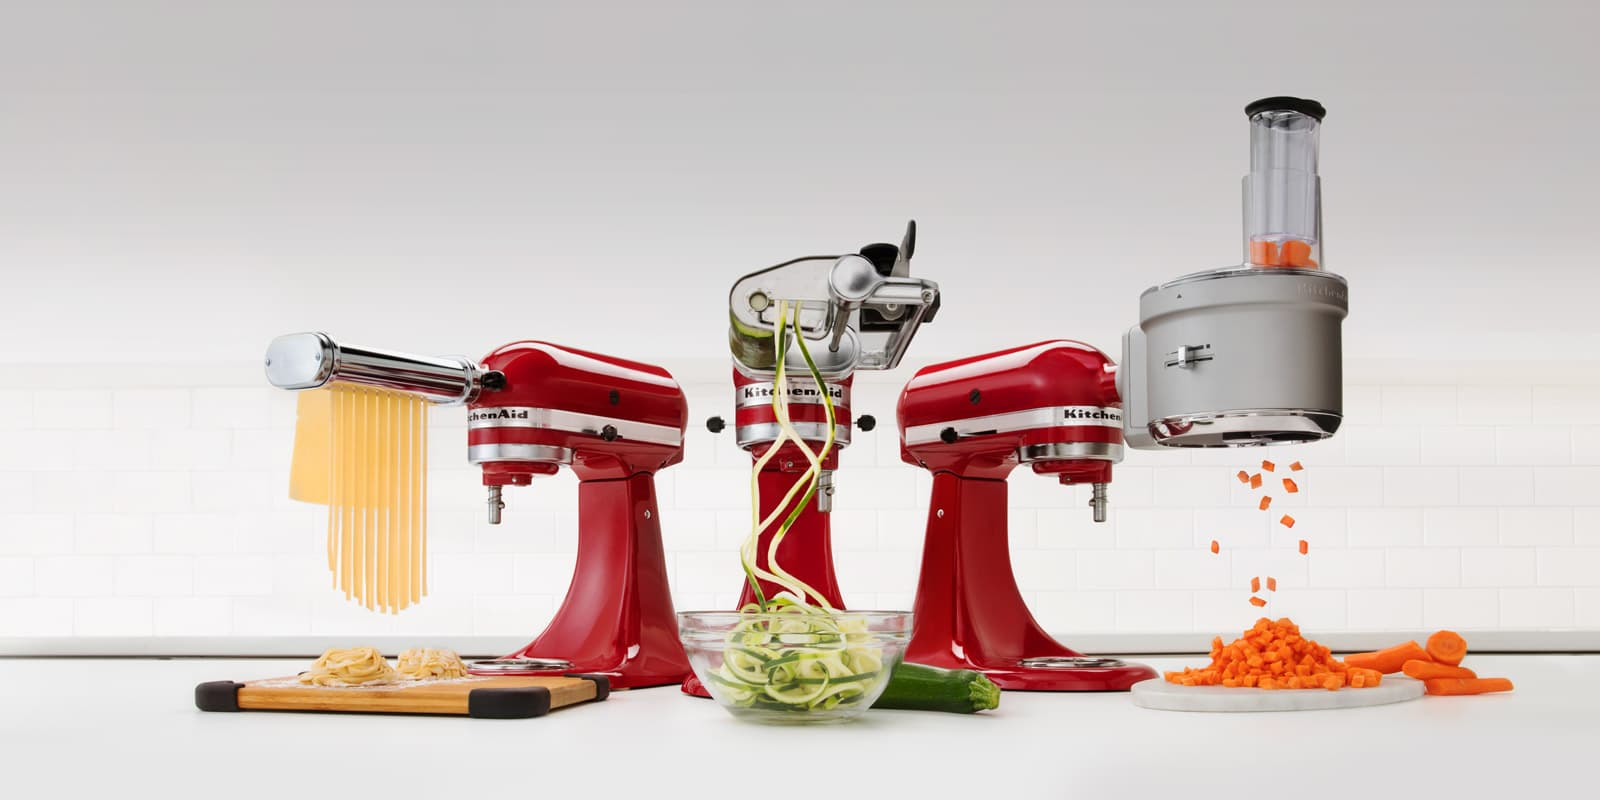 kitchen aid k5ss hutch ideas kitchenaid mixer design inspiration furniture for your 6 9 l artisan stand 5ksm7580x uk rh co